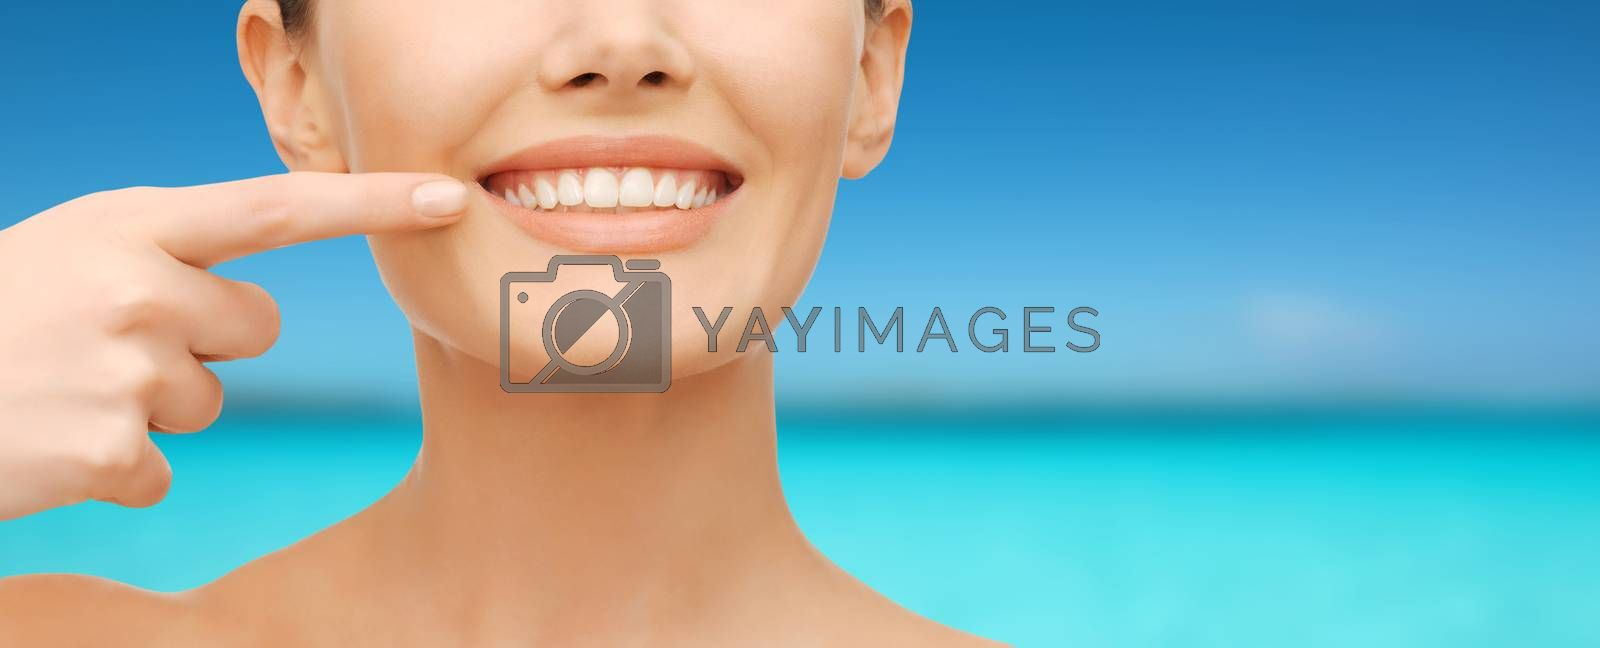 beautiful woman pointing to teeth by dolgachov